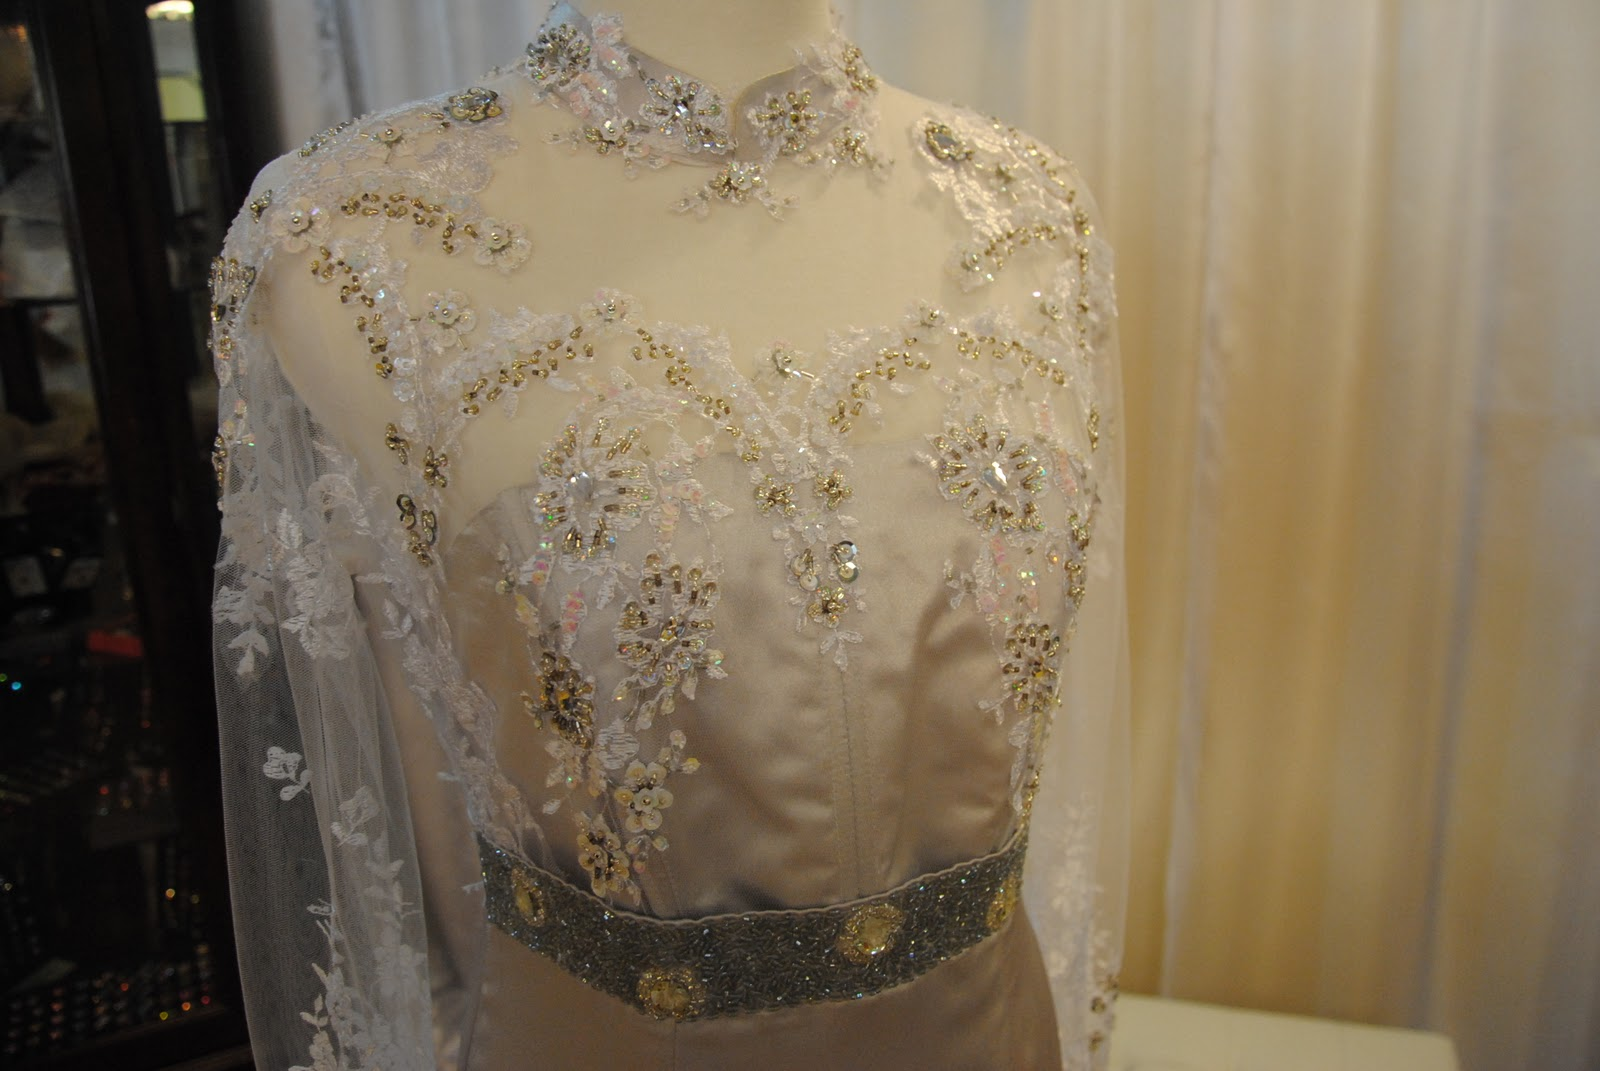 Butik Kerawang: Tailor / Butik Esklusif Wanita / Wedding Planner